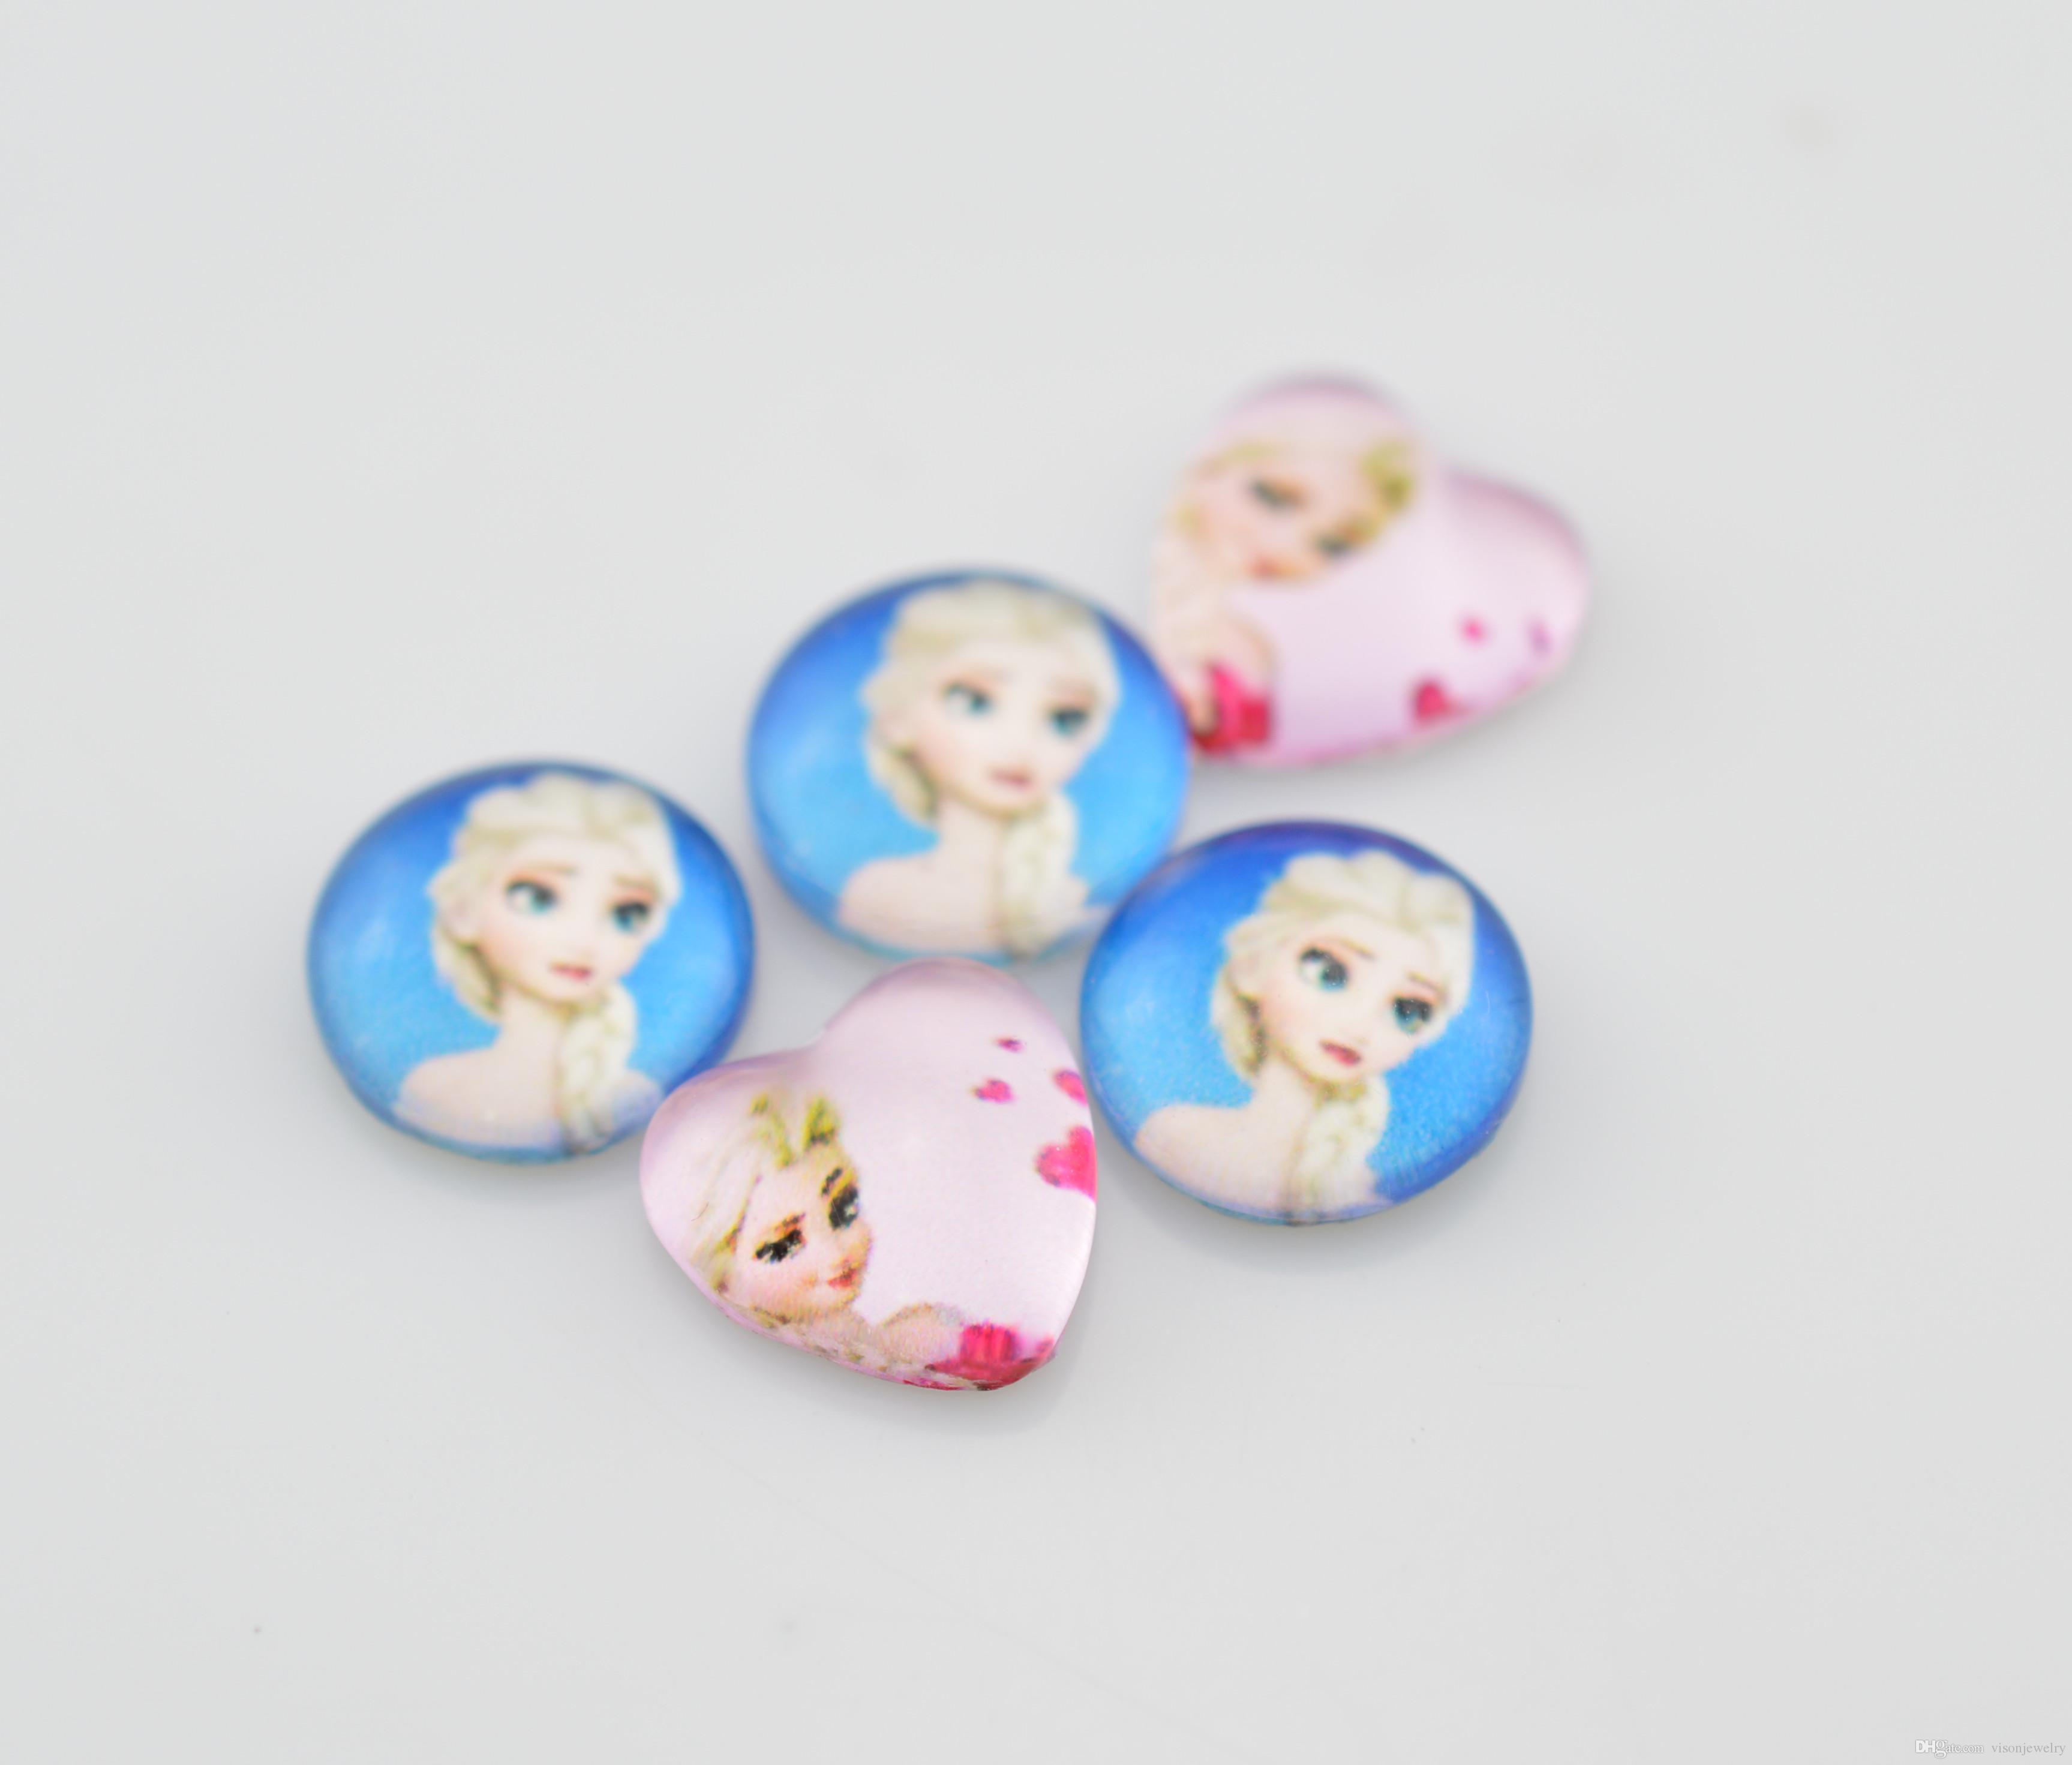 Character Charm Necklace Disney Frozen Character Elsa